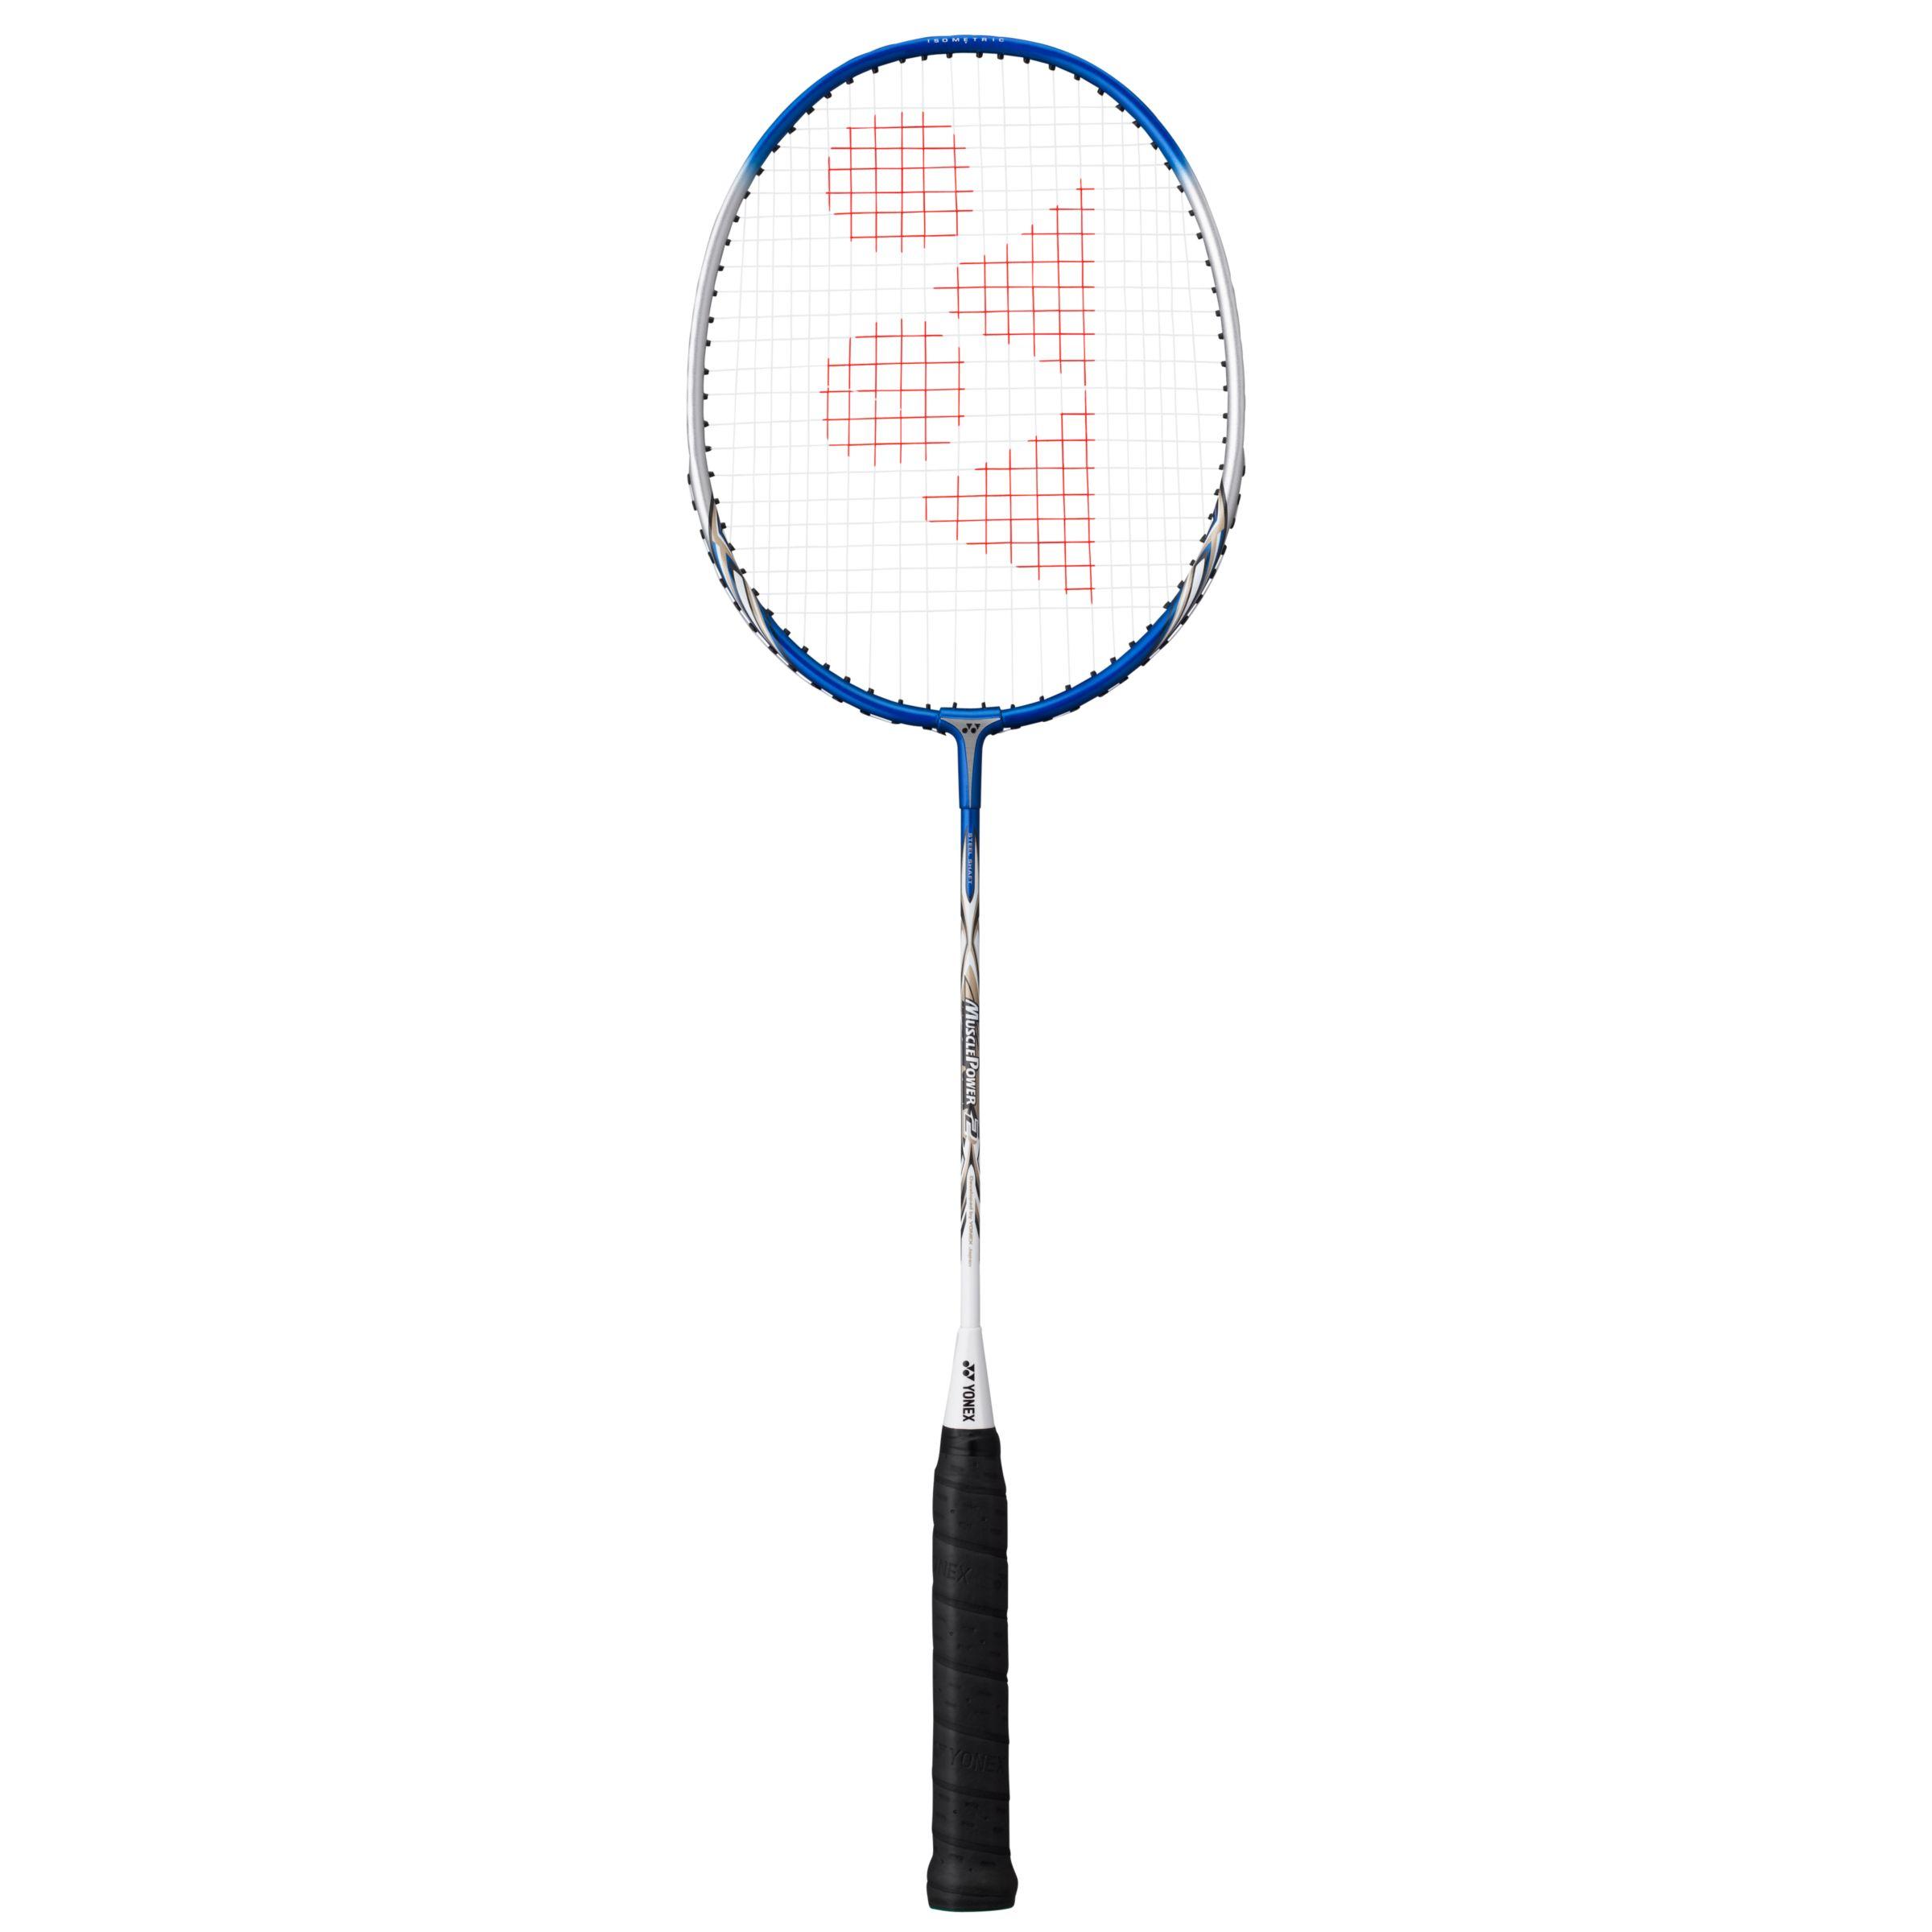 Yonex Yonex Muscle Power 2 Badminton Racquet, Blue/Silver